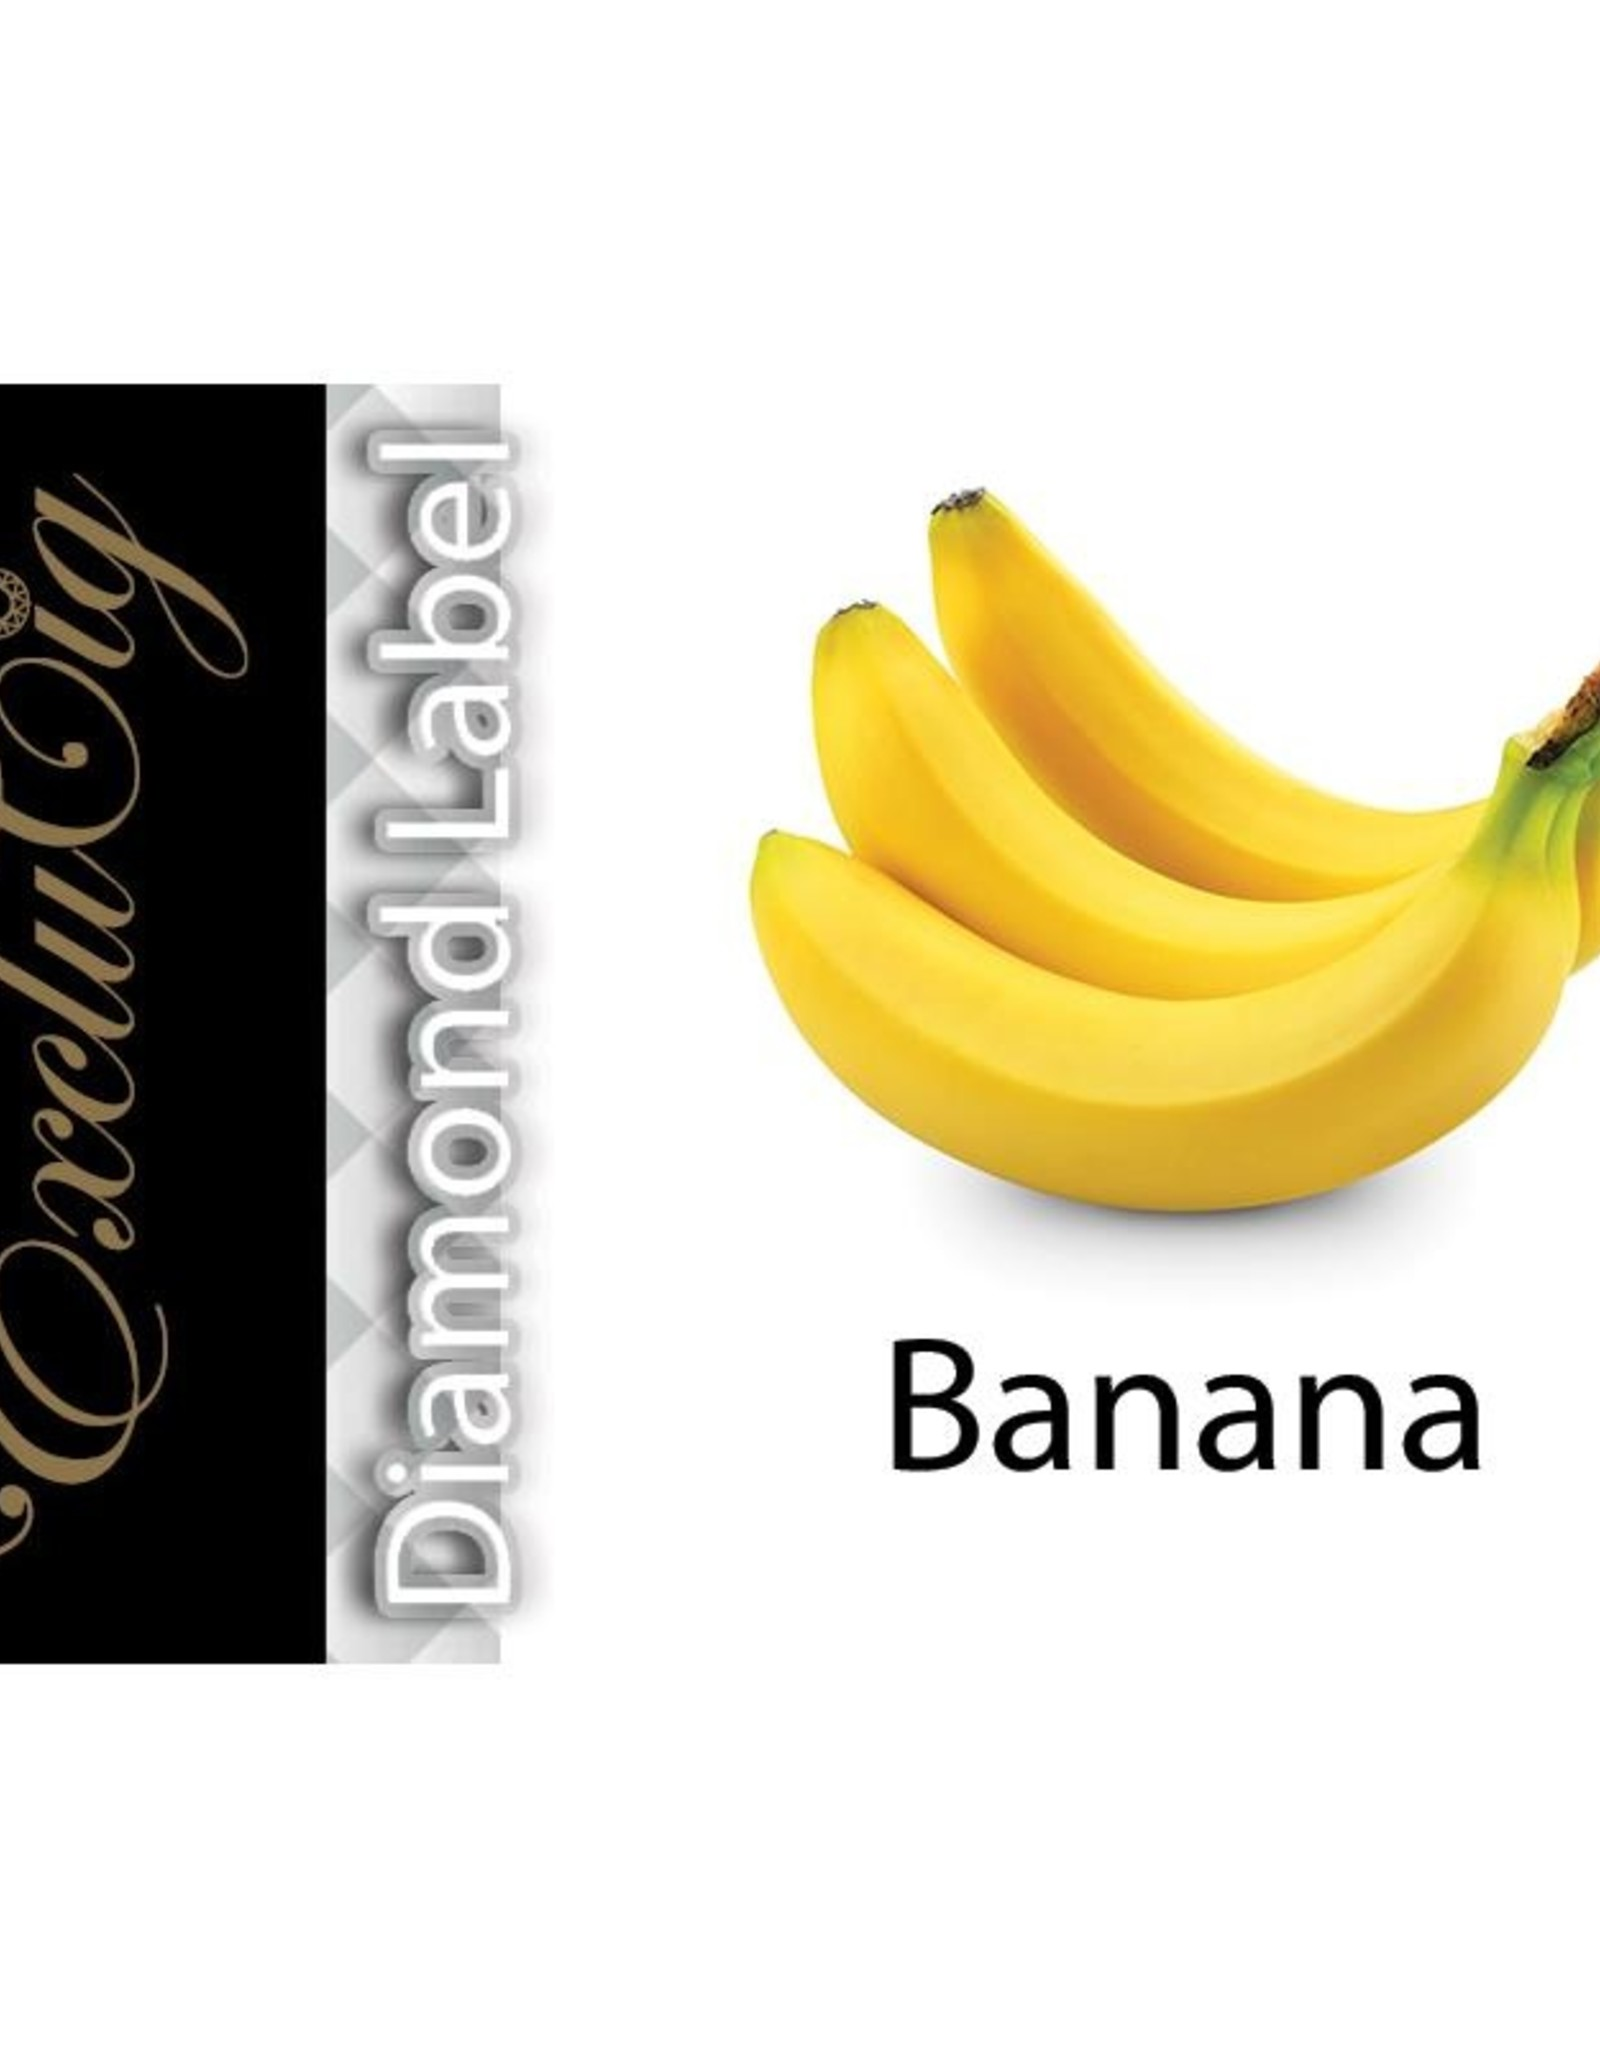 Exclucig Exclucig Diamond Label E-liquid Banana 3 mg Nicotine